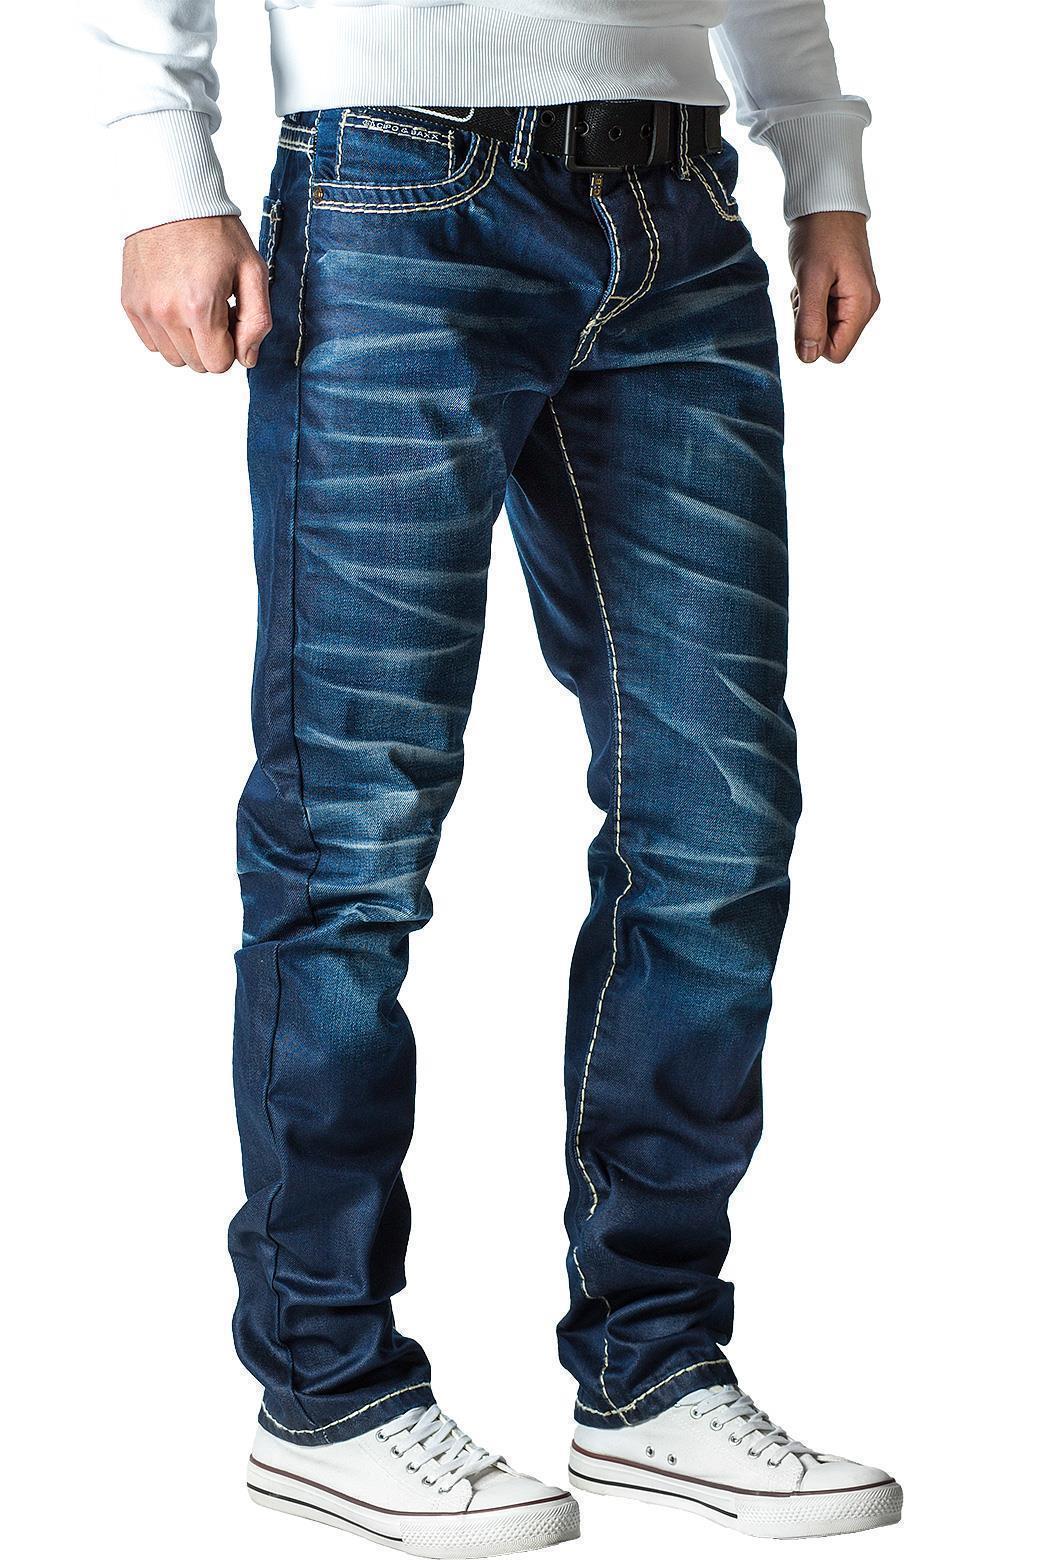 Cipo-amp-Baxx-Uomo-Jeans-Pantaloni-ricamate-Biker-Style-streetwear-nervature-pattern-Dope miniatura 16